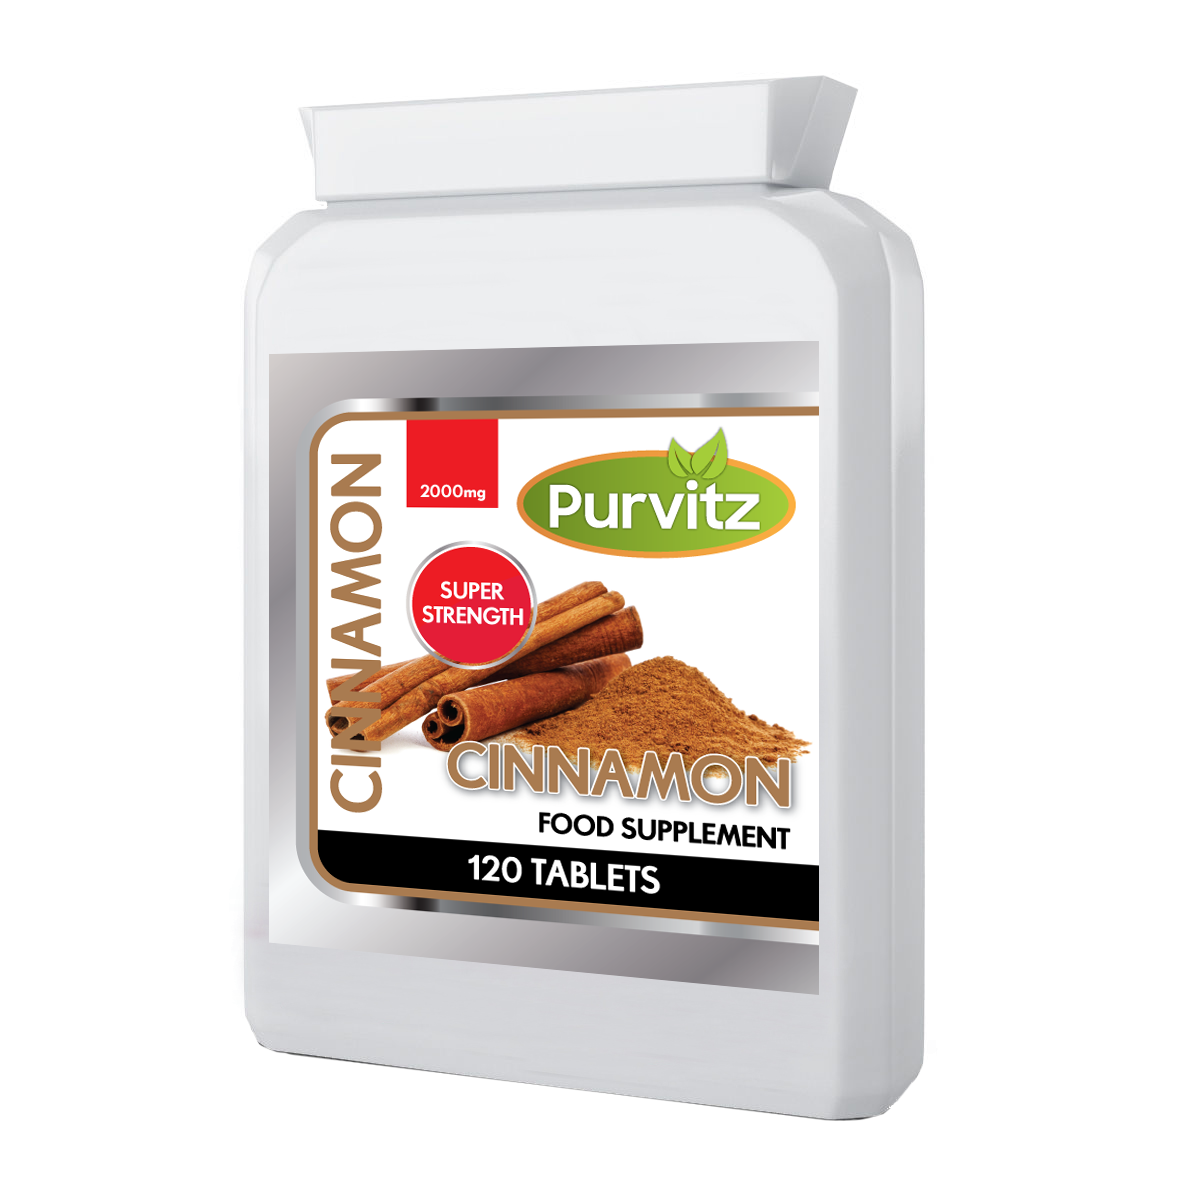 Cinnamon 2000mg Weight Loss Blood Sugar Digestive Slimming Tablets Purvitz UK